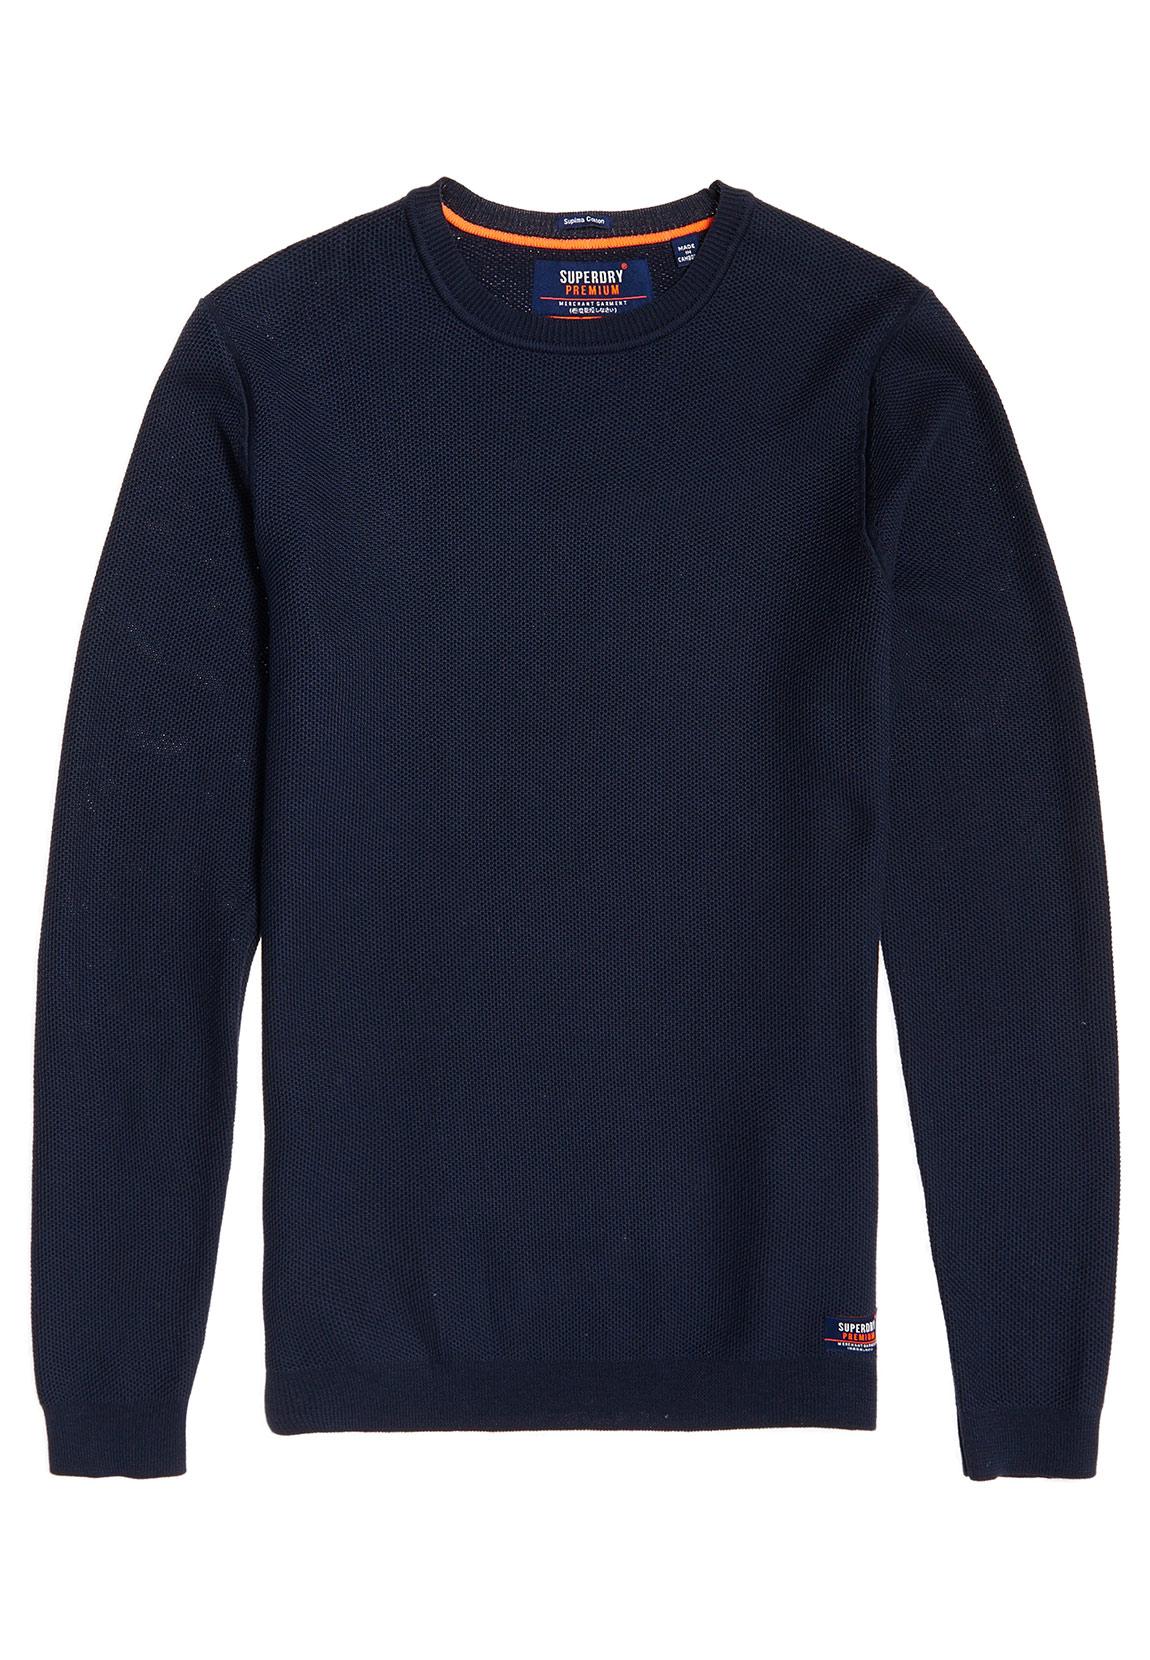 Superdry Sweater Men's Supima Cotton Crew Cloud | eBay